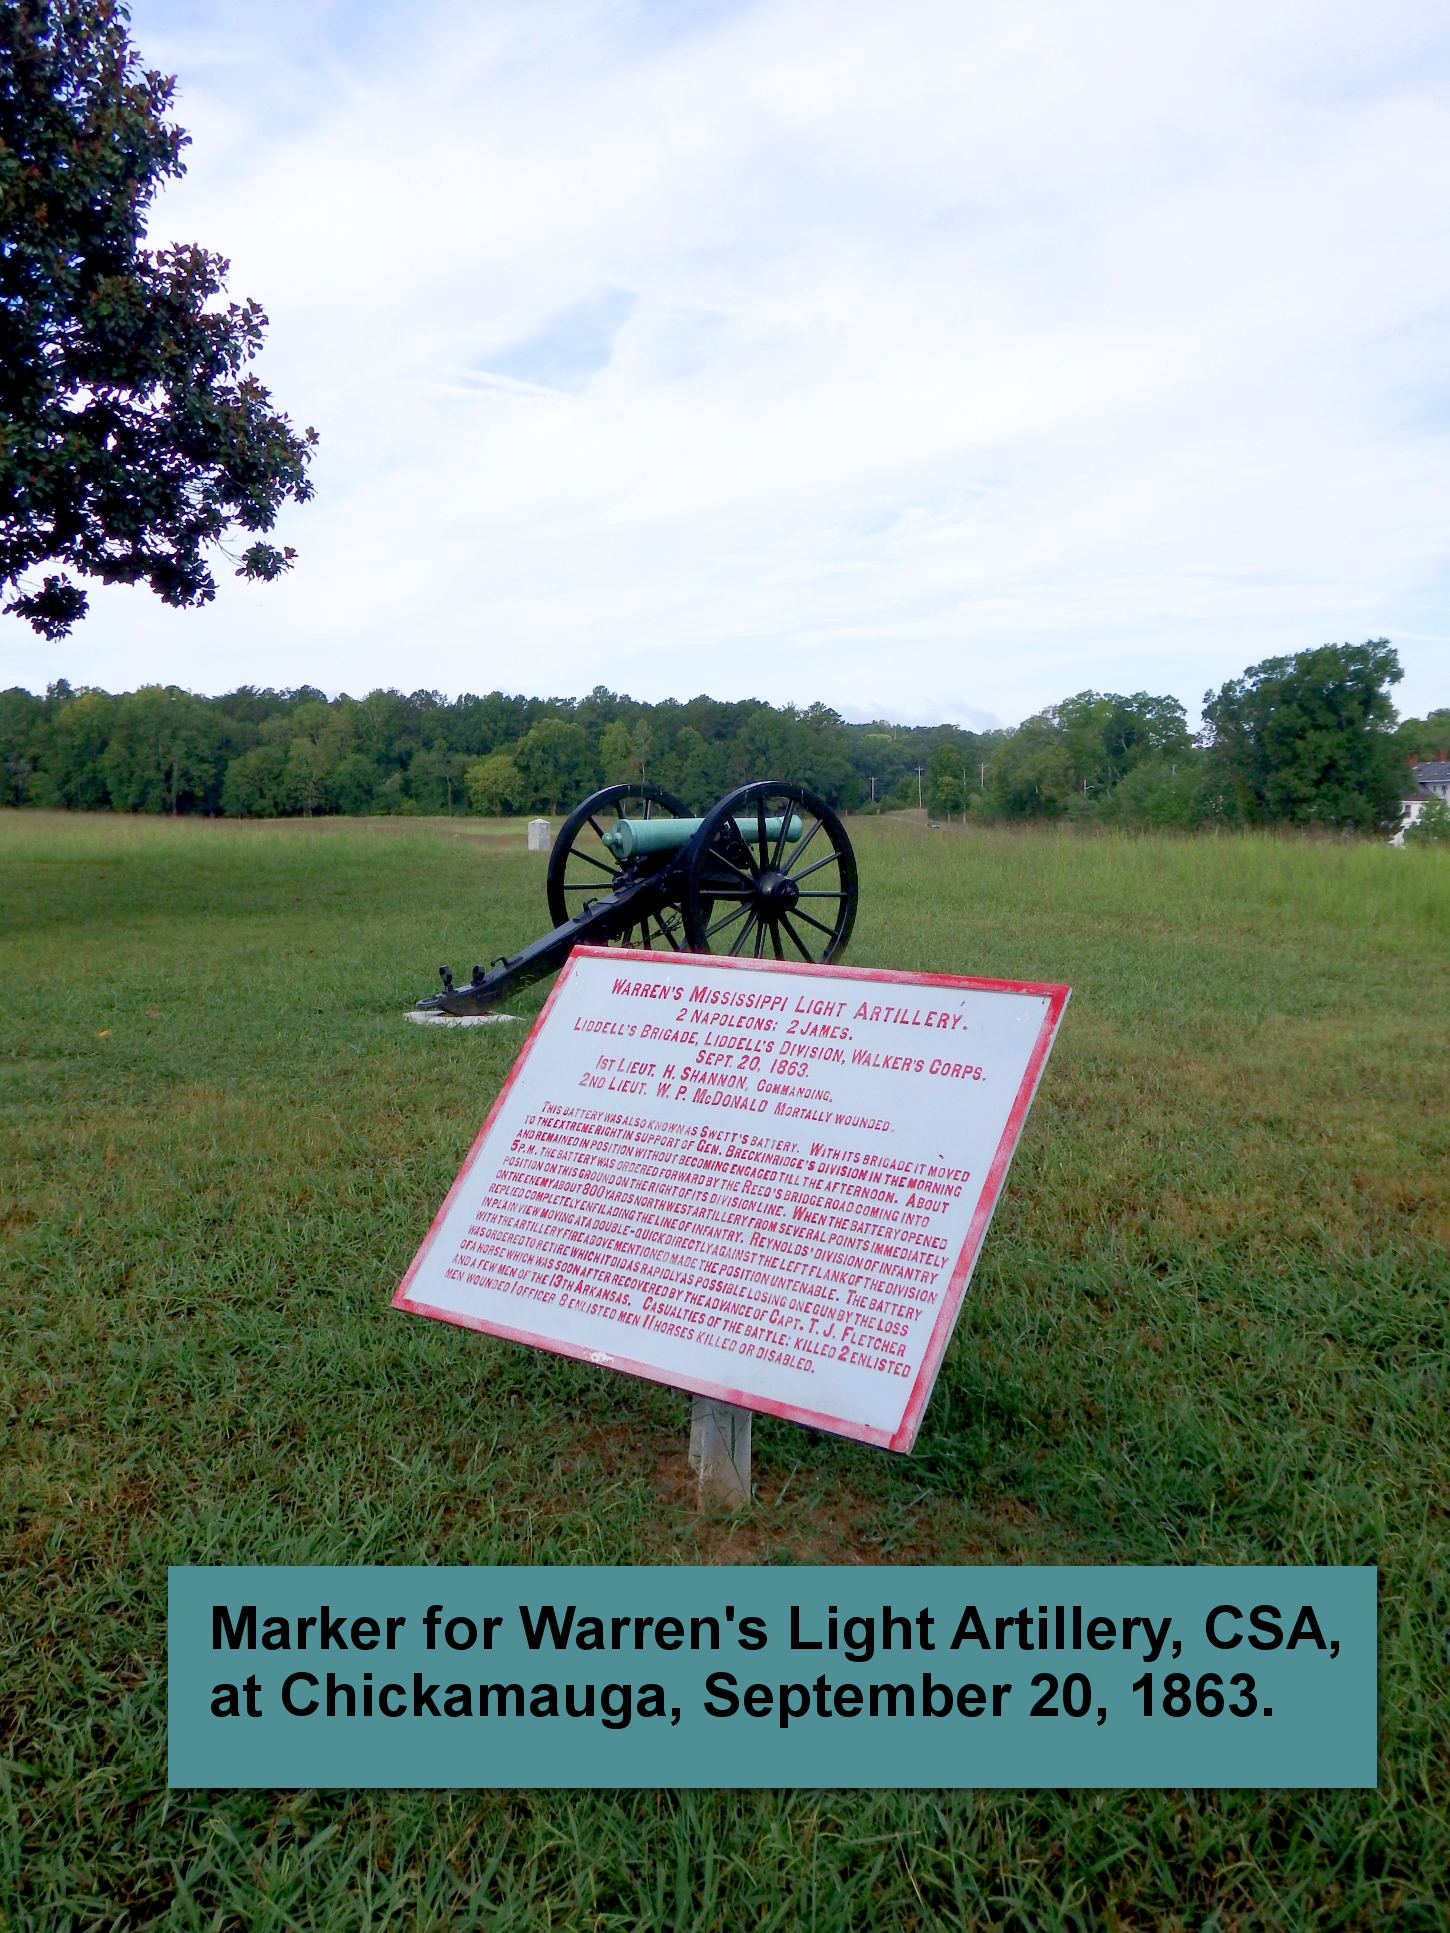 Peace was not restored by guns alone. Chickamauga